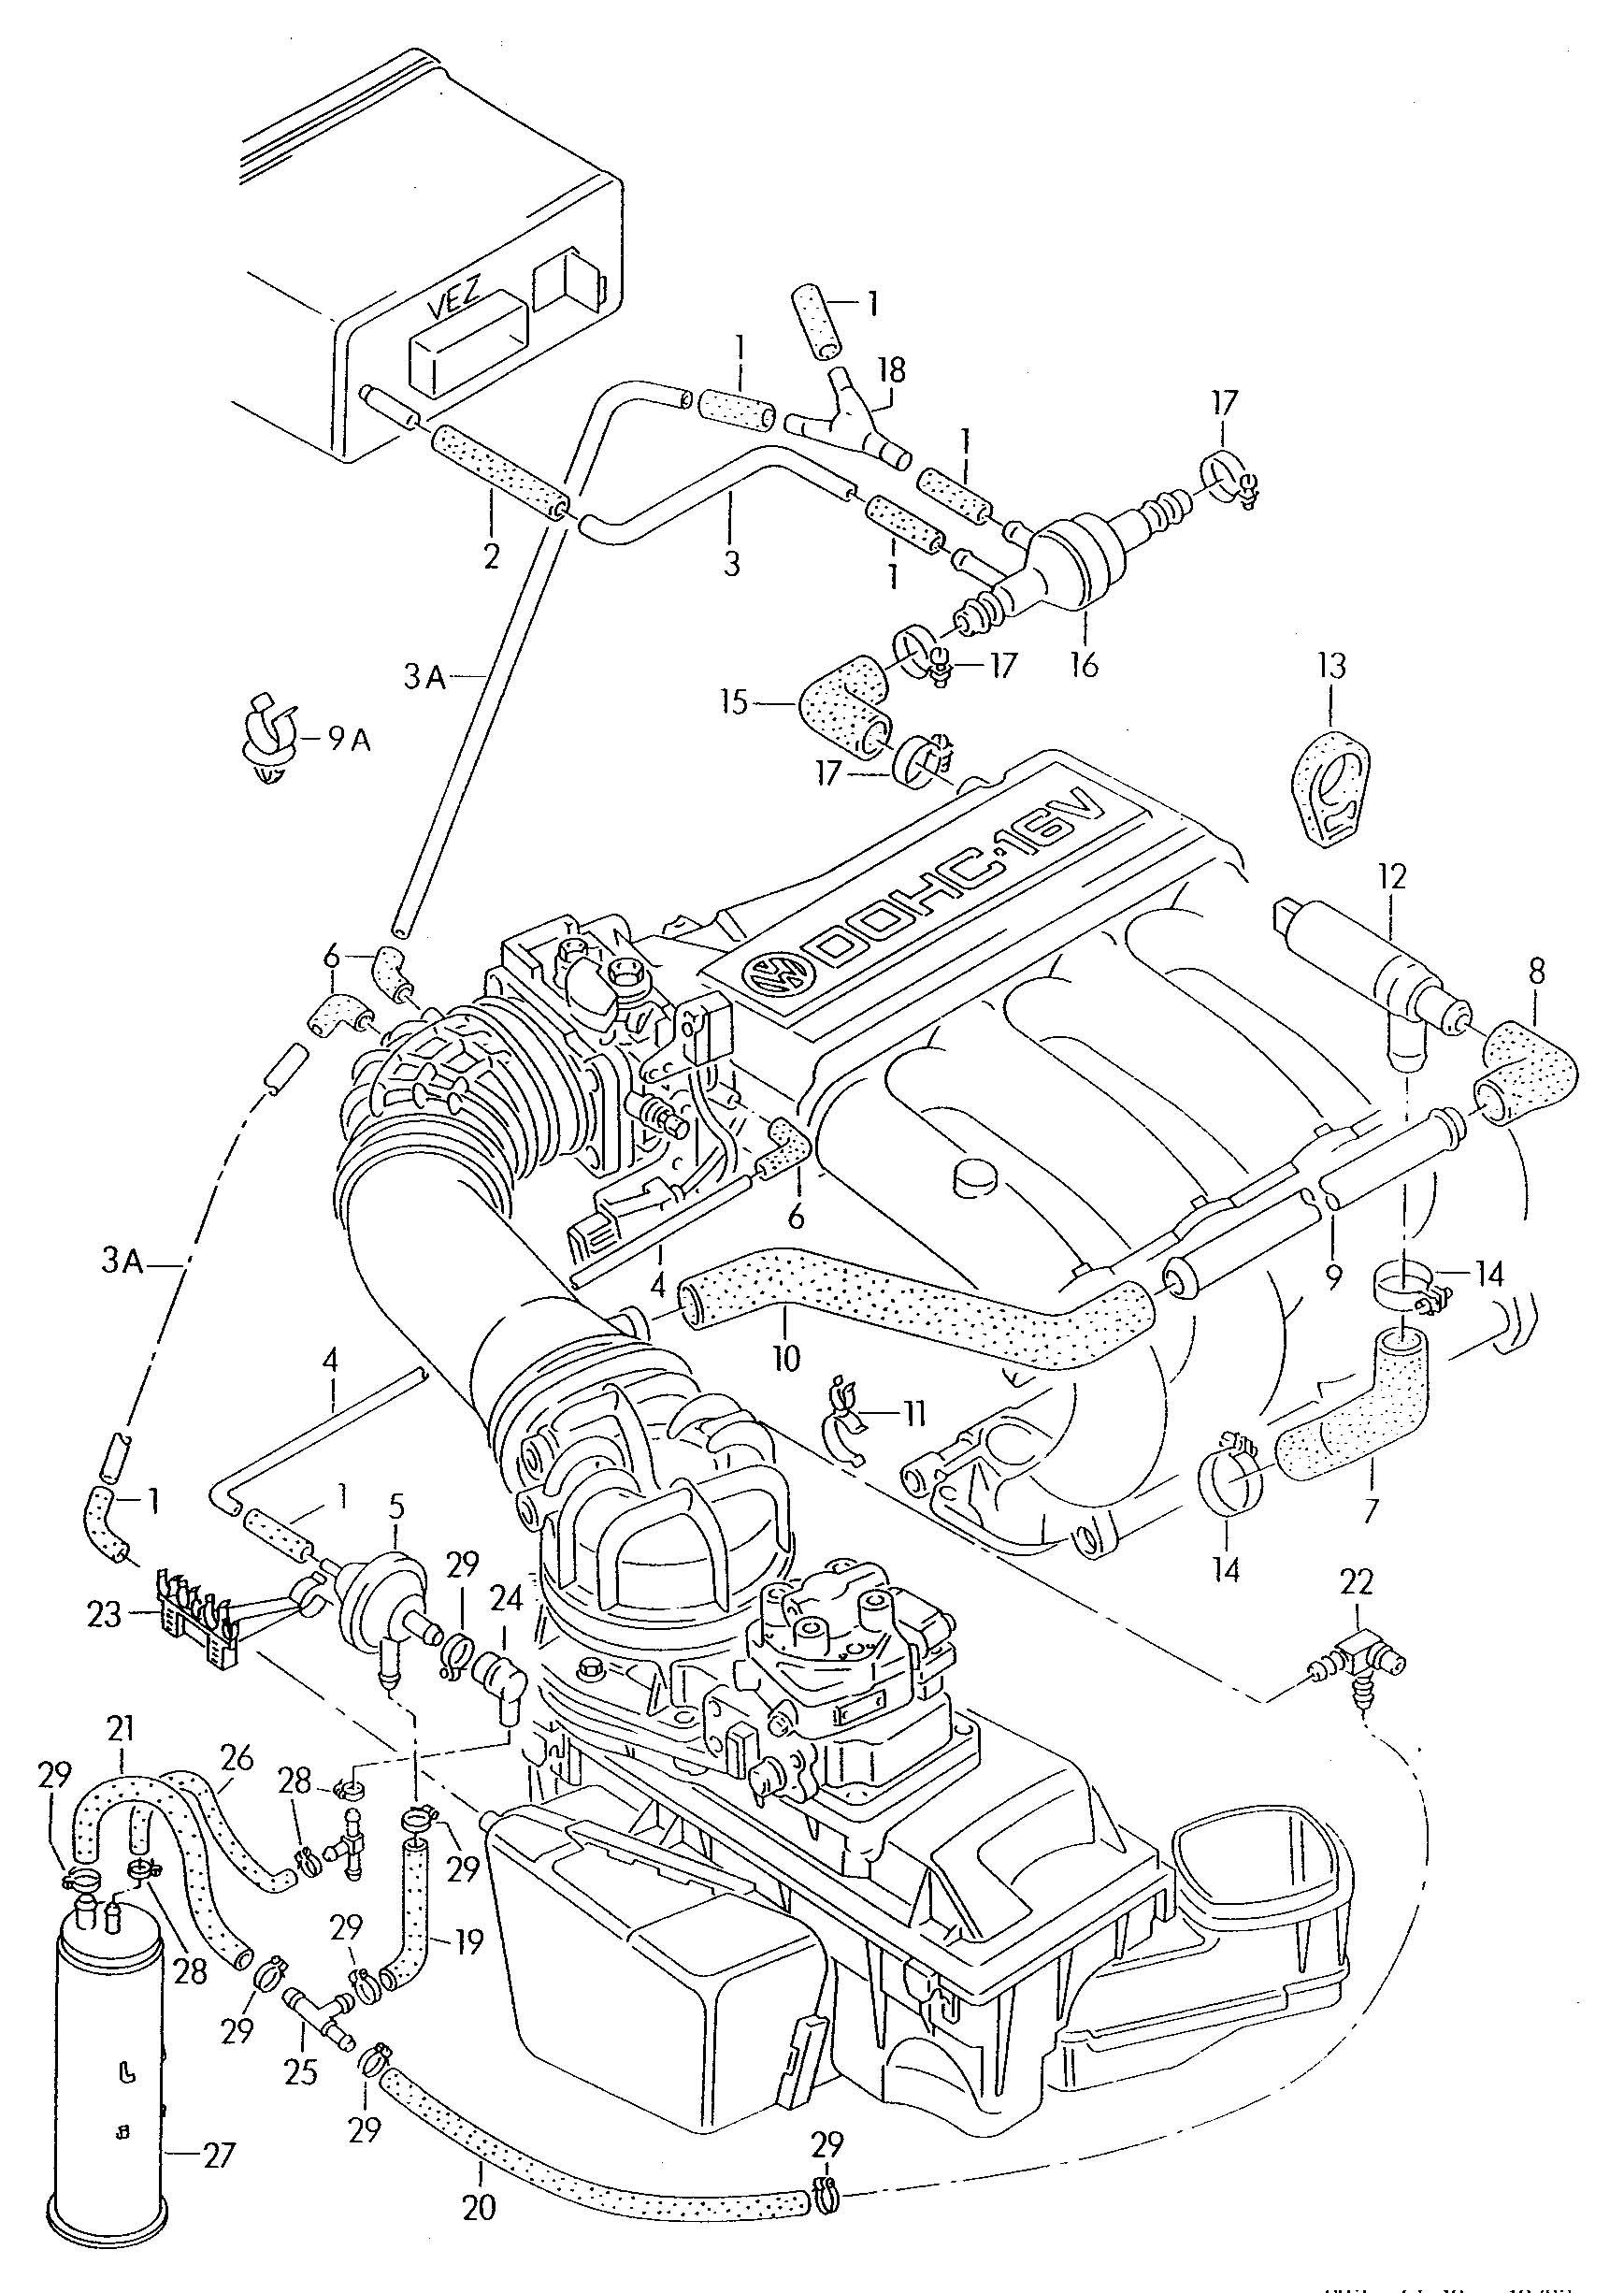 1988 Volkswagen Cabriolet Wiring Diagram Chevy Astro